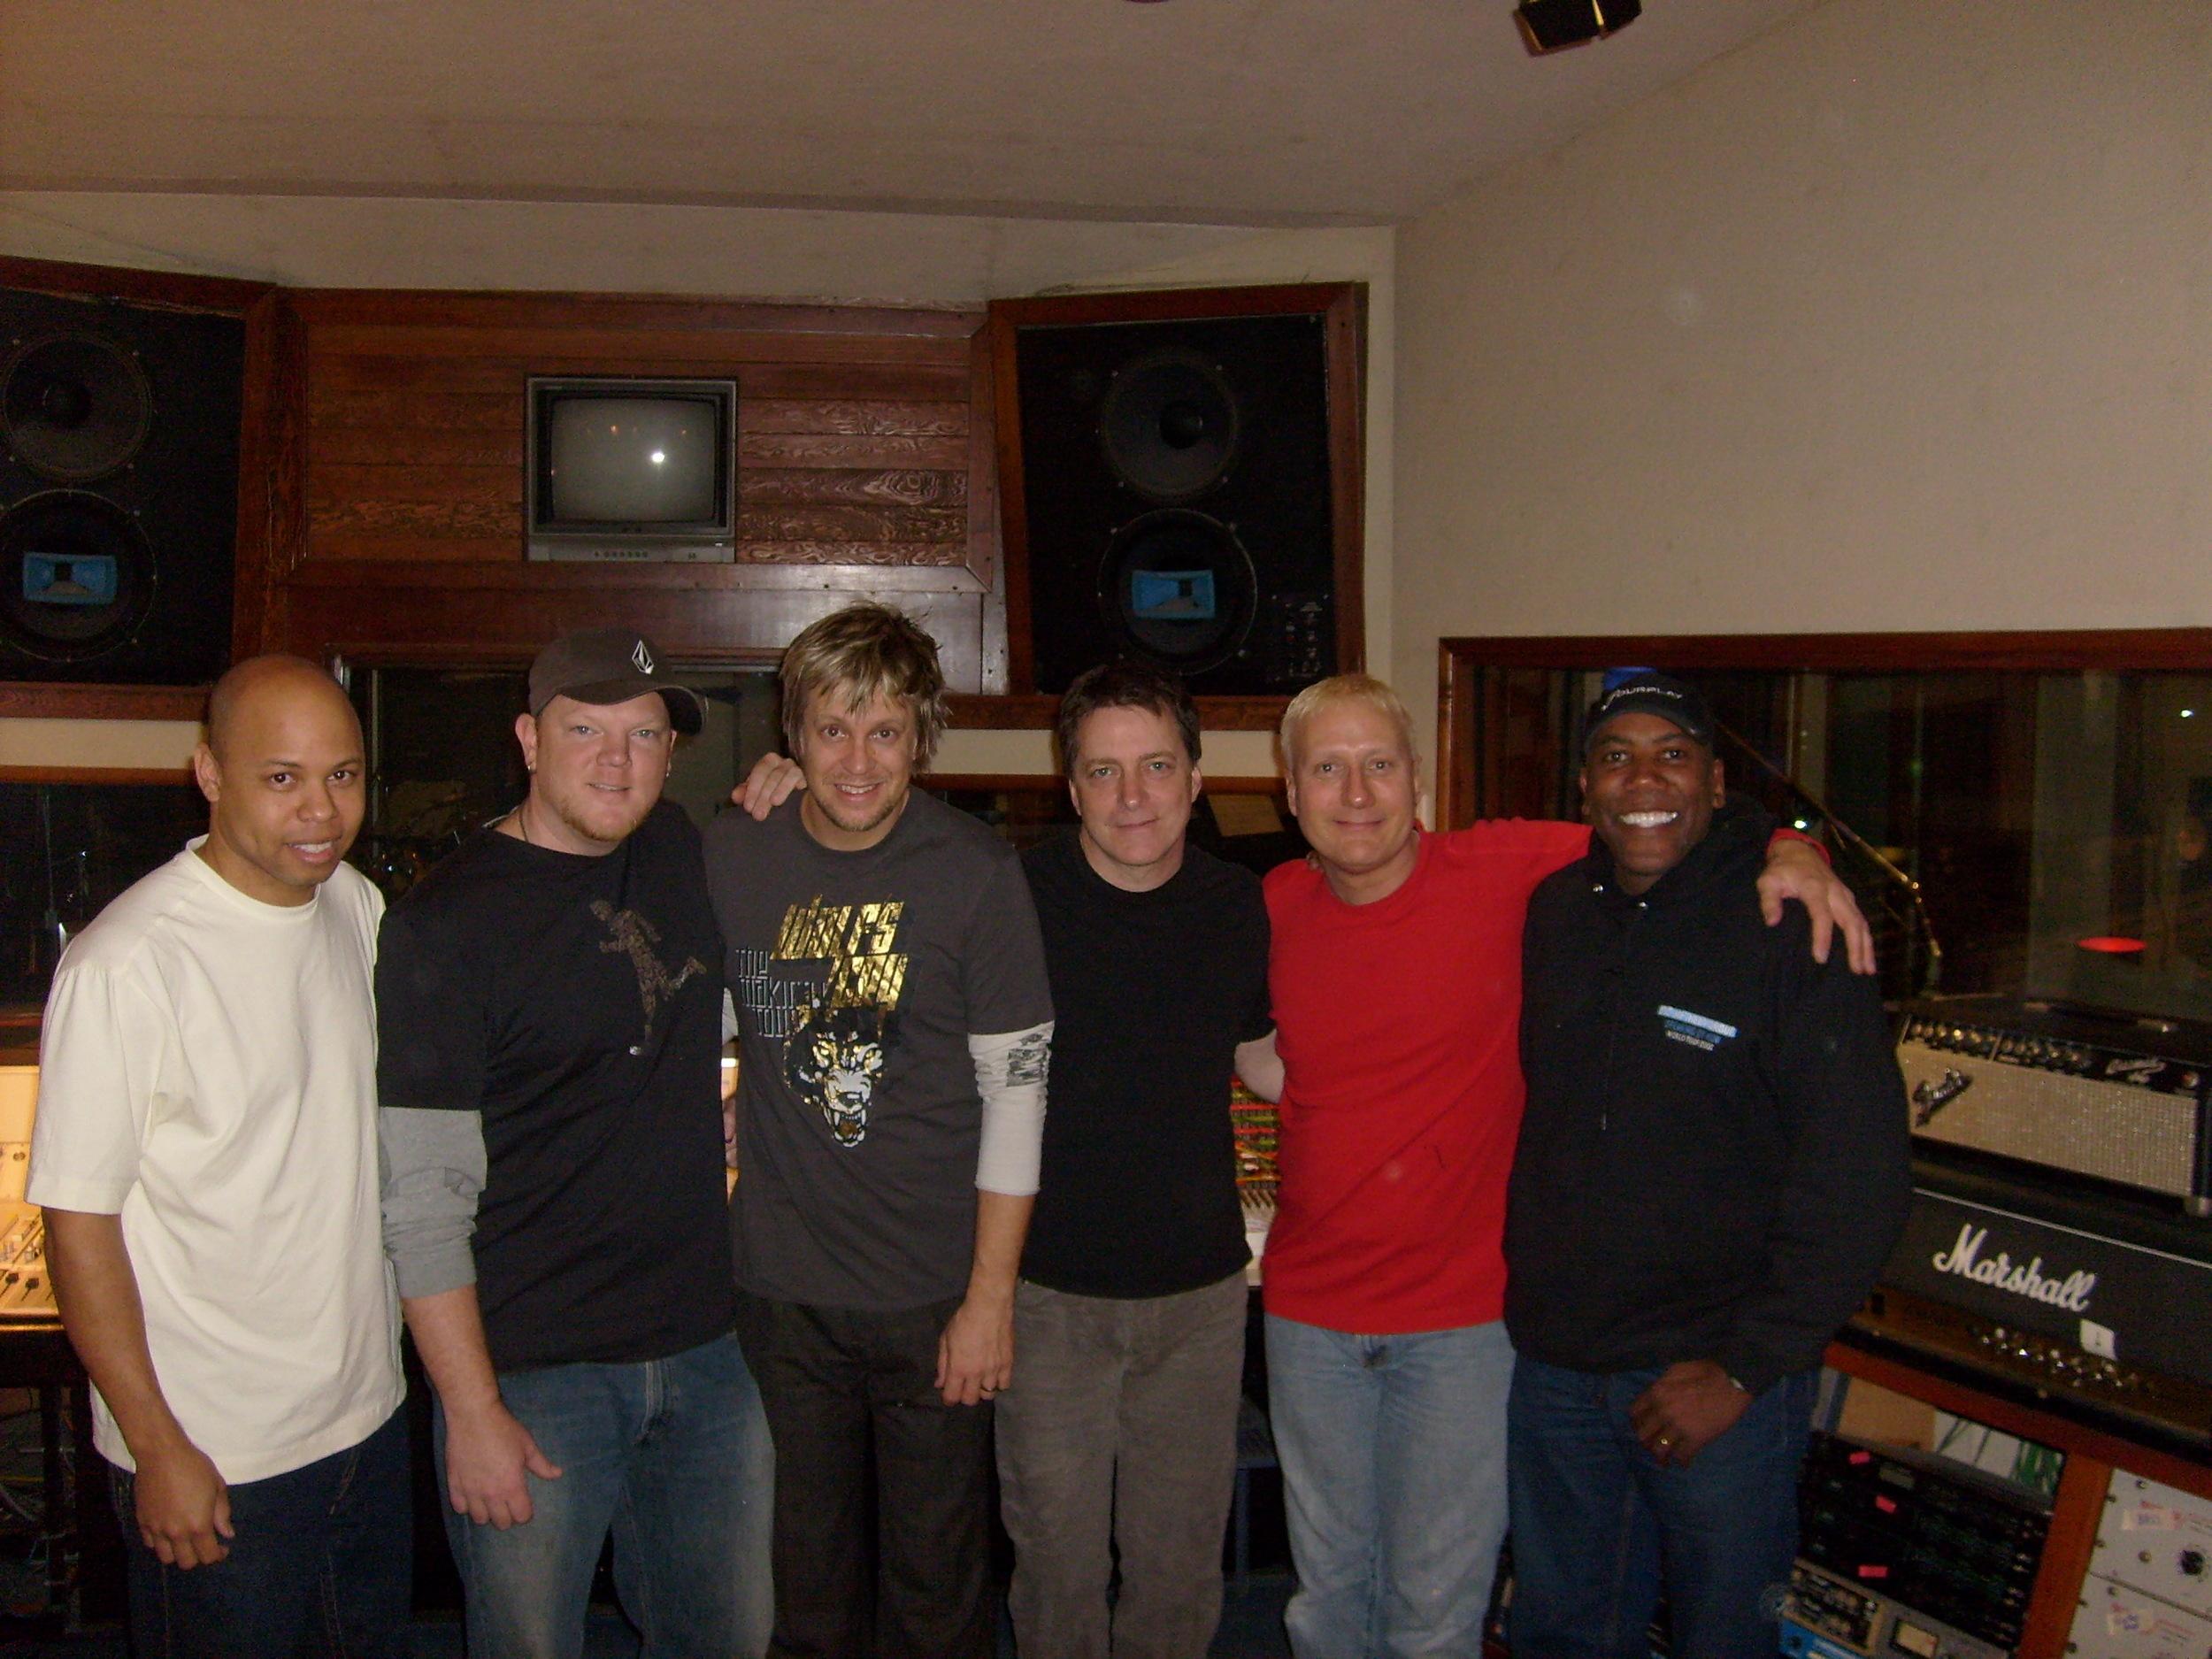 recording Generosity Water Project Dec., 2008 w/ Chris James, Dan Lutz, James Harrah, Gregg Bissonette & Nathan East